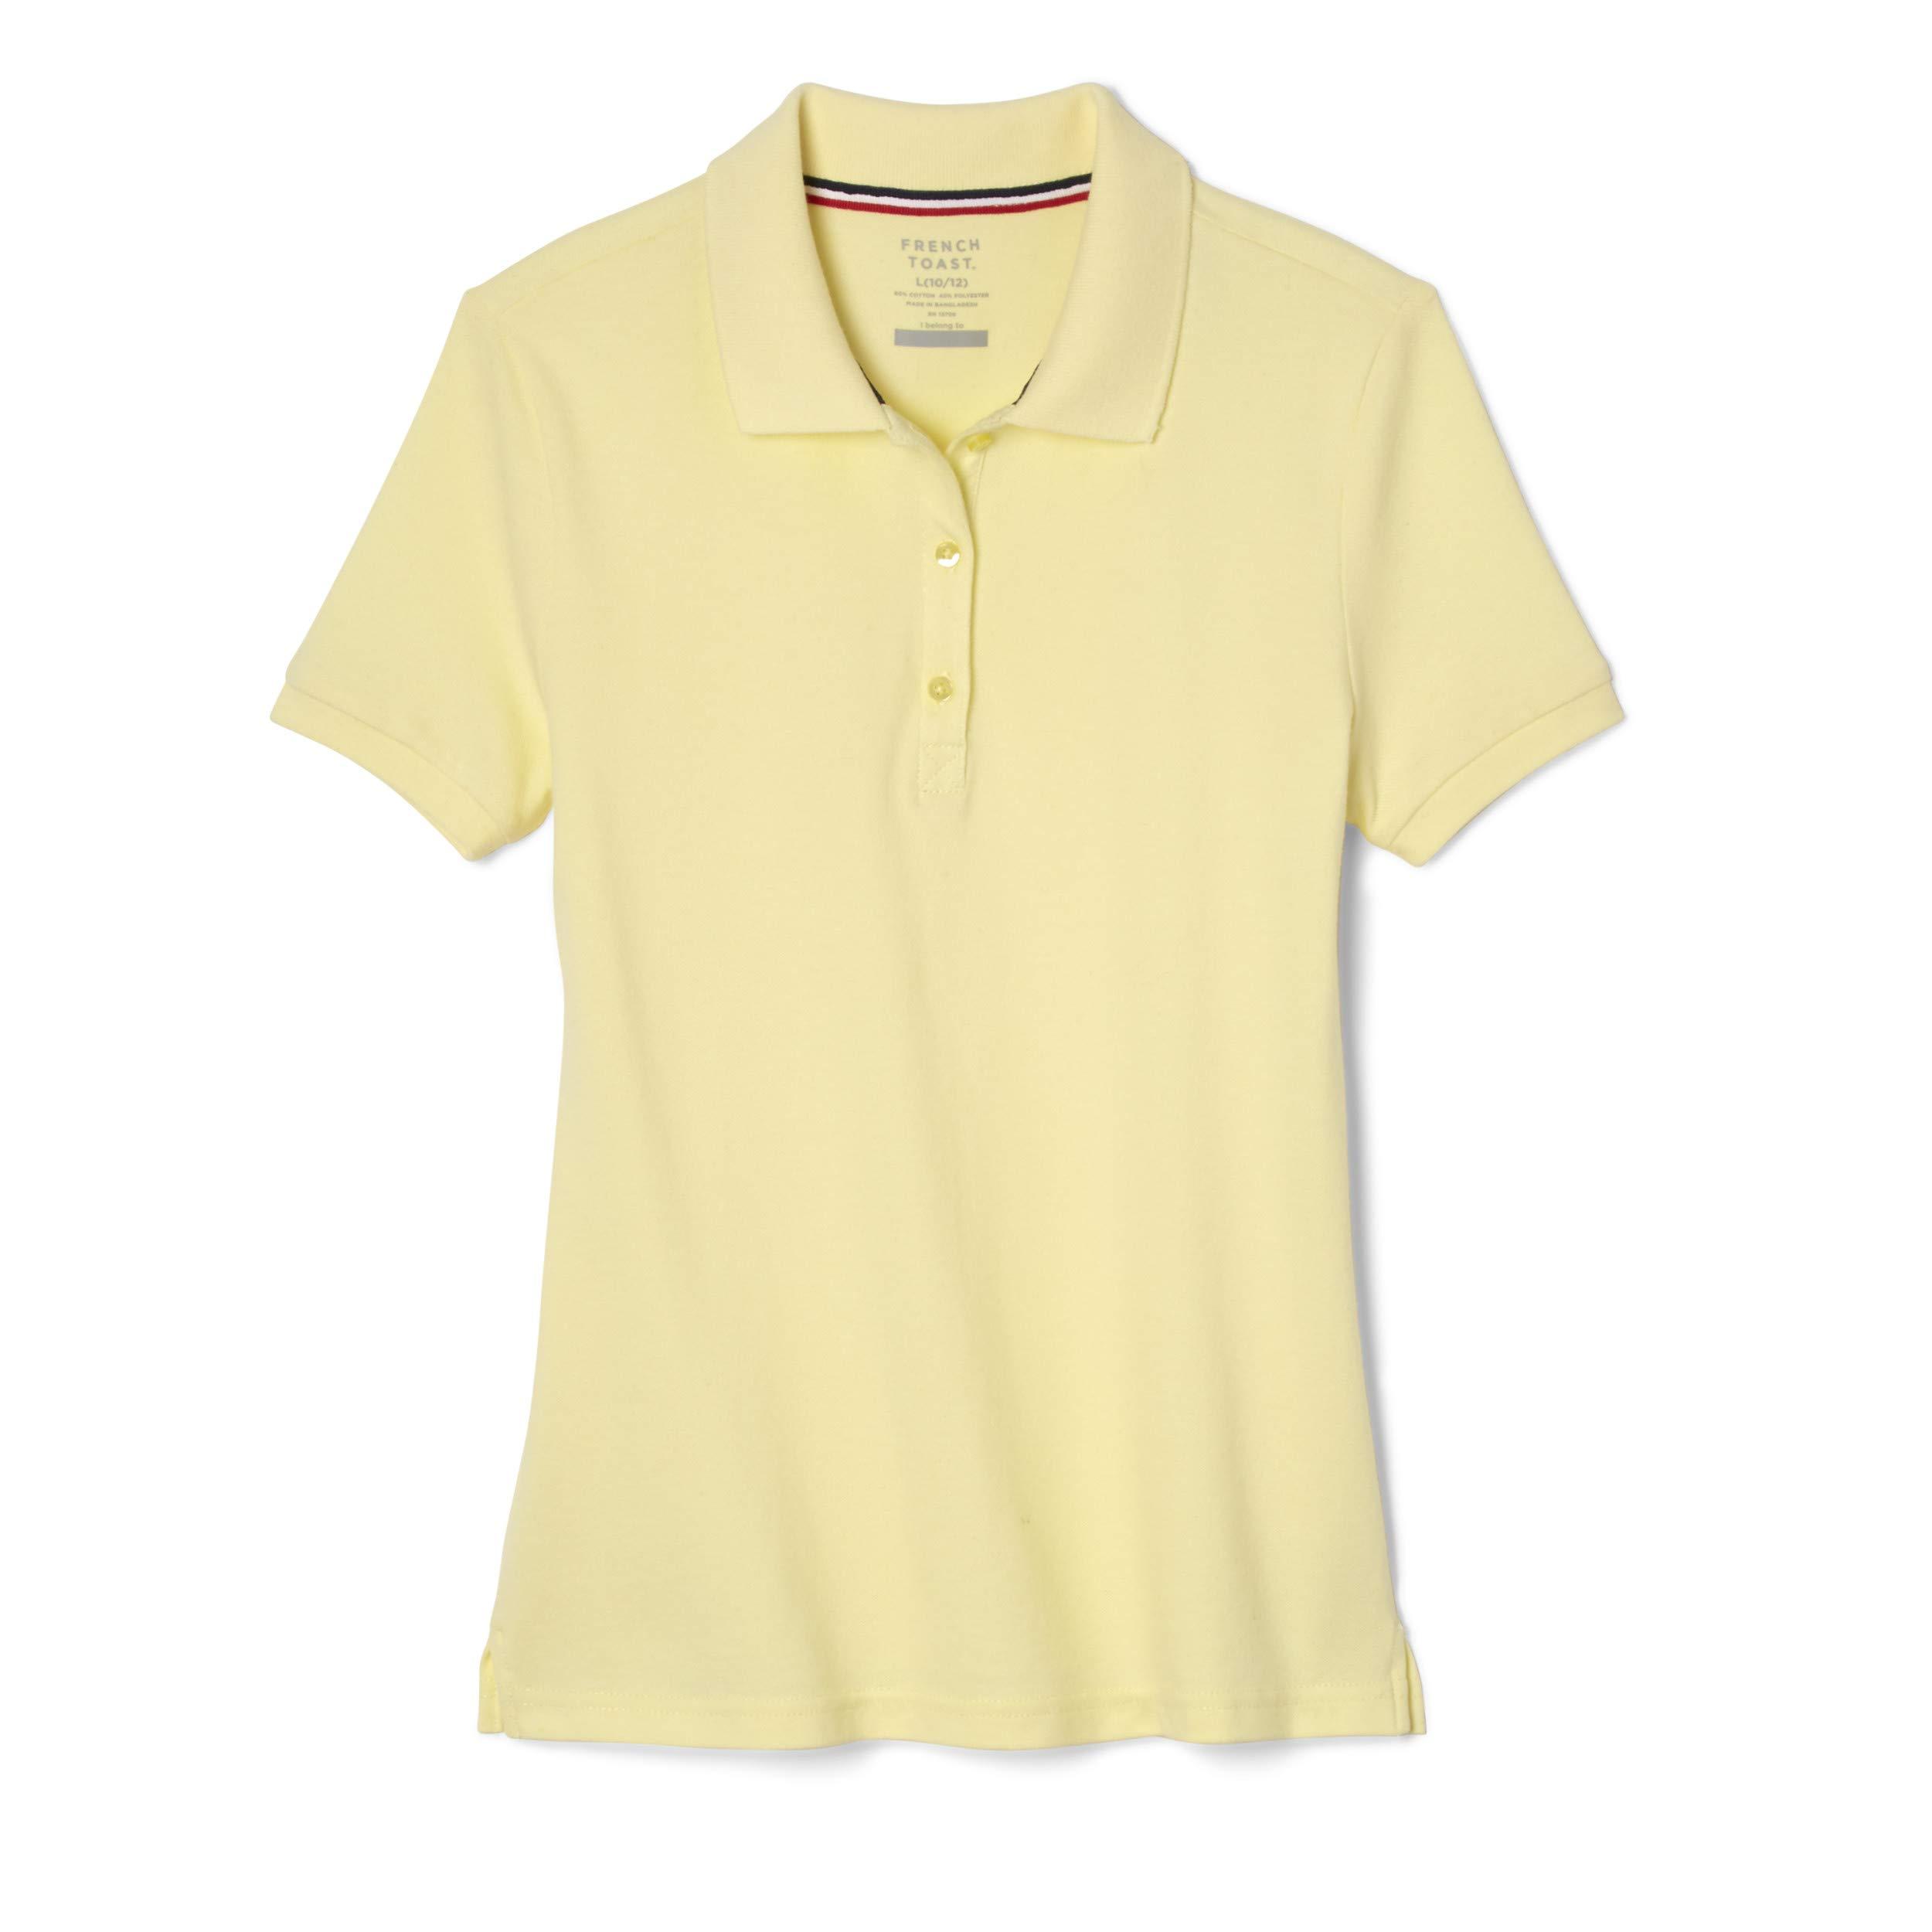 French Toast School Uniform Girls Short Sleeve Stretch Pique Polo Shirt, Yellow, 6